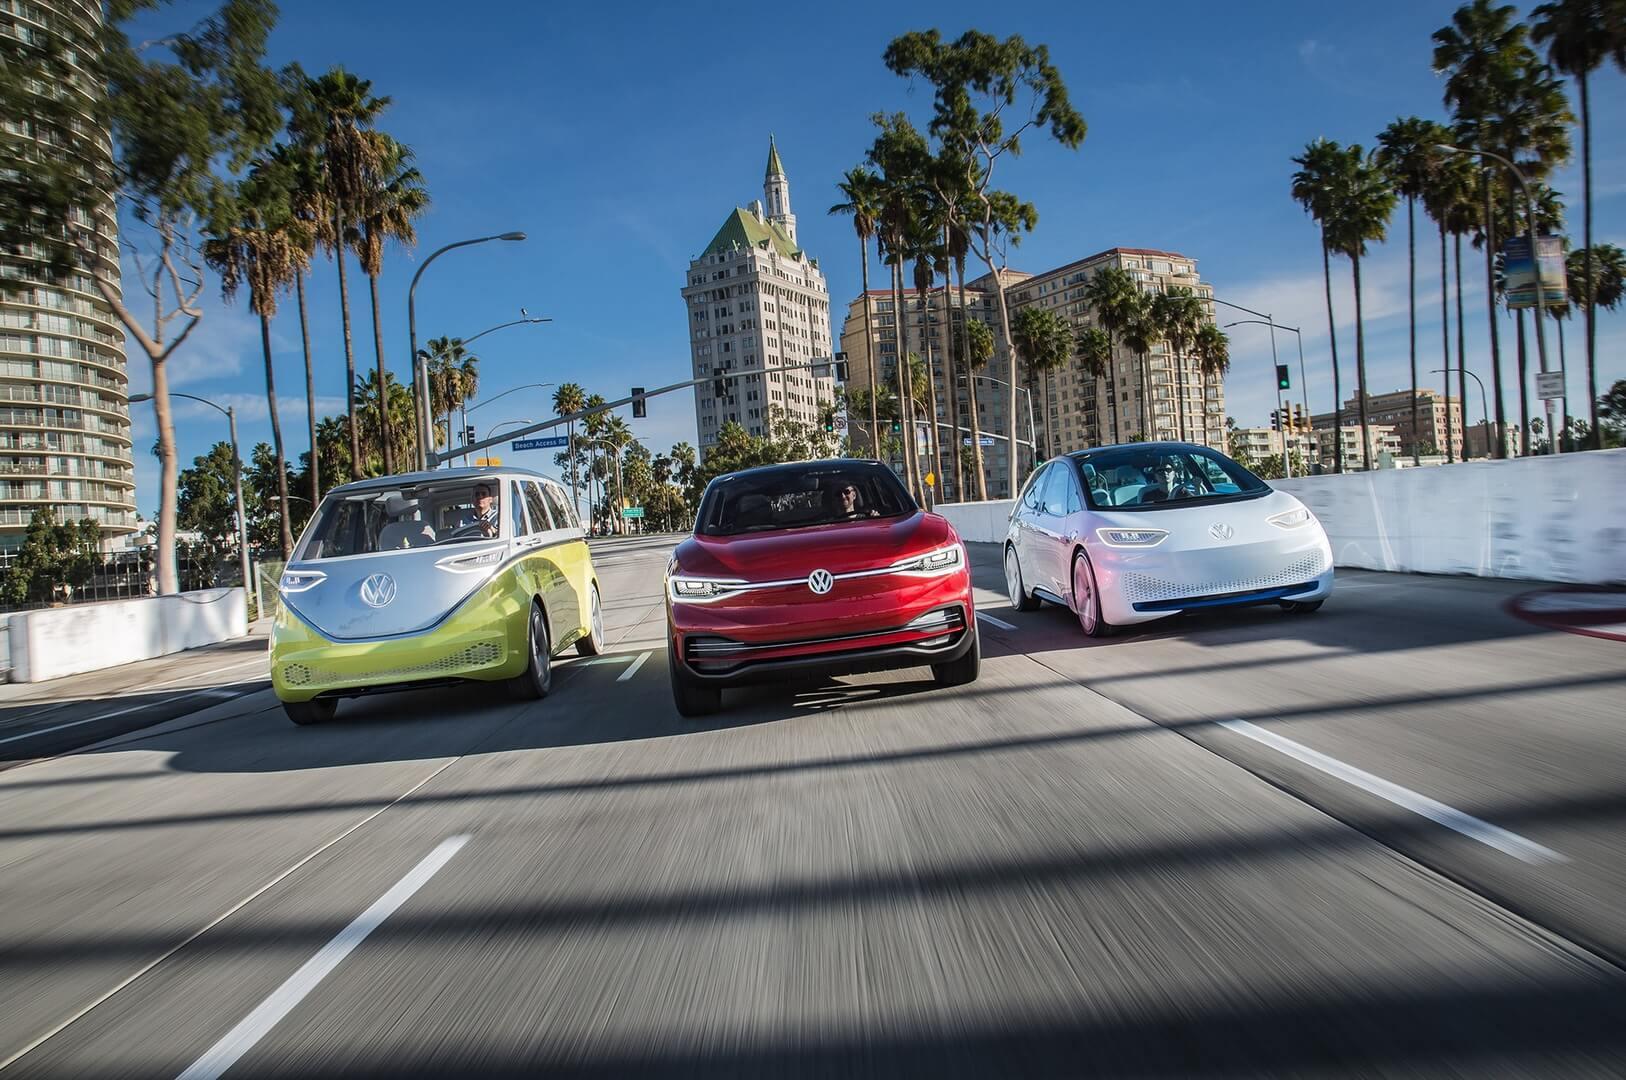 Электрические автомобили Volkswagen I.D. на платформе MEB